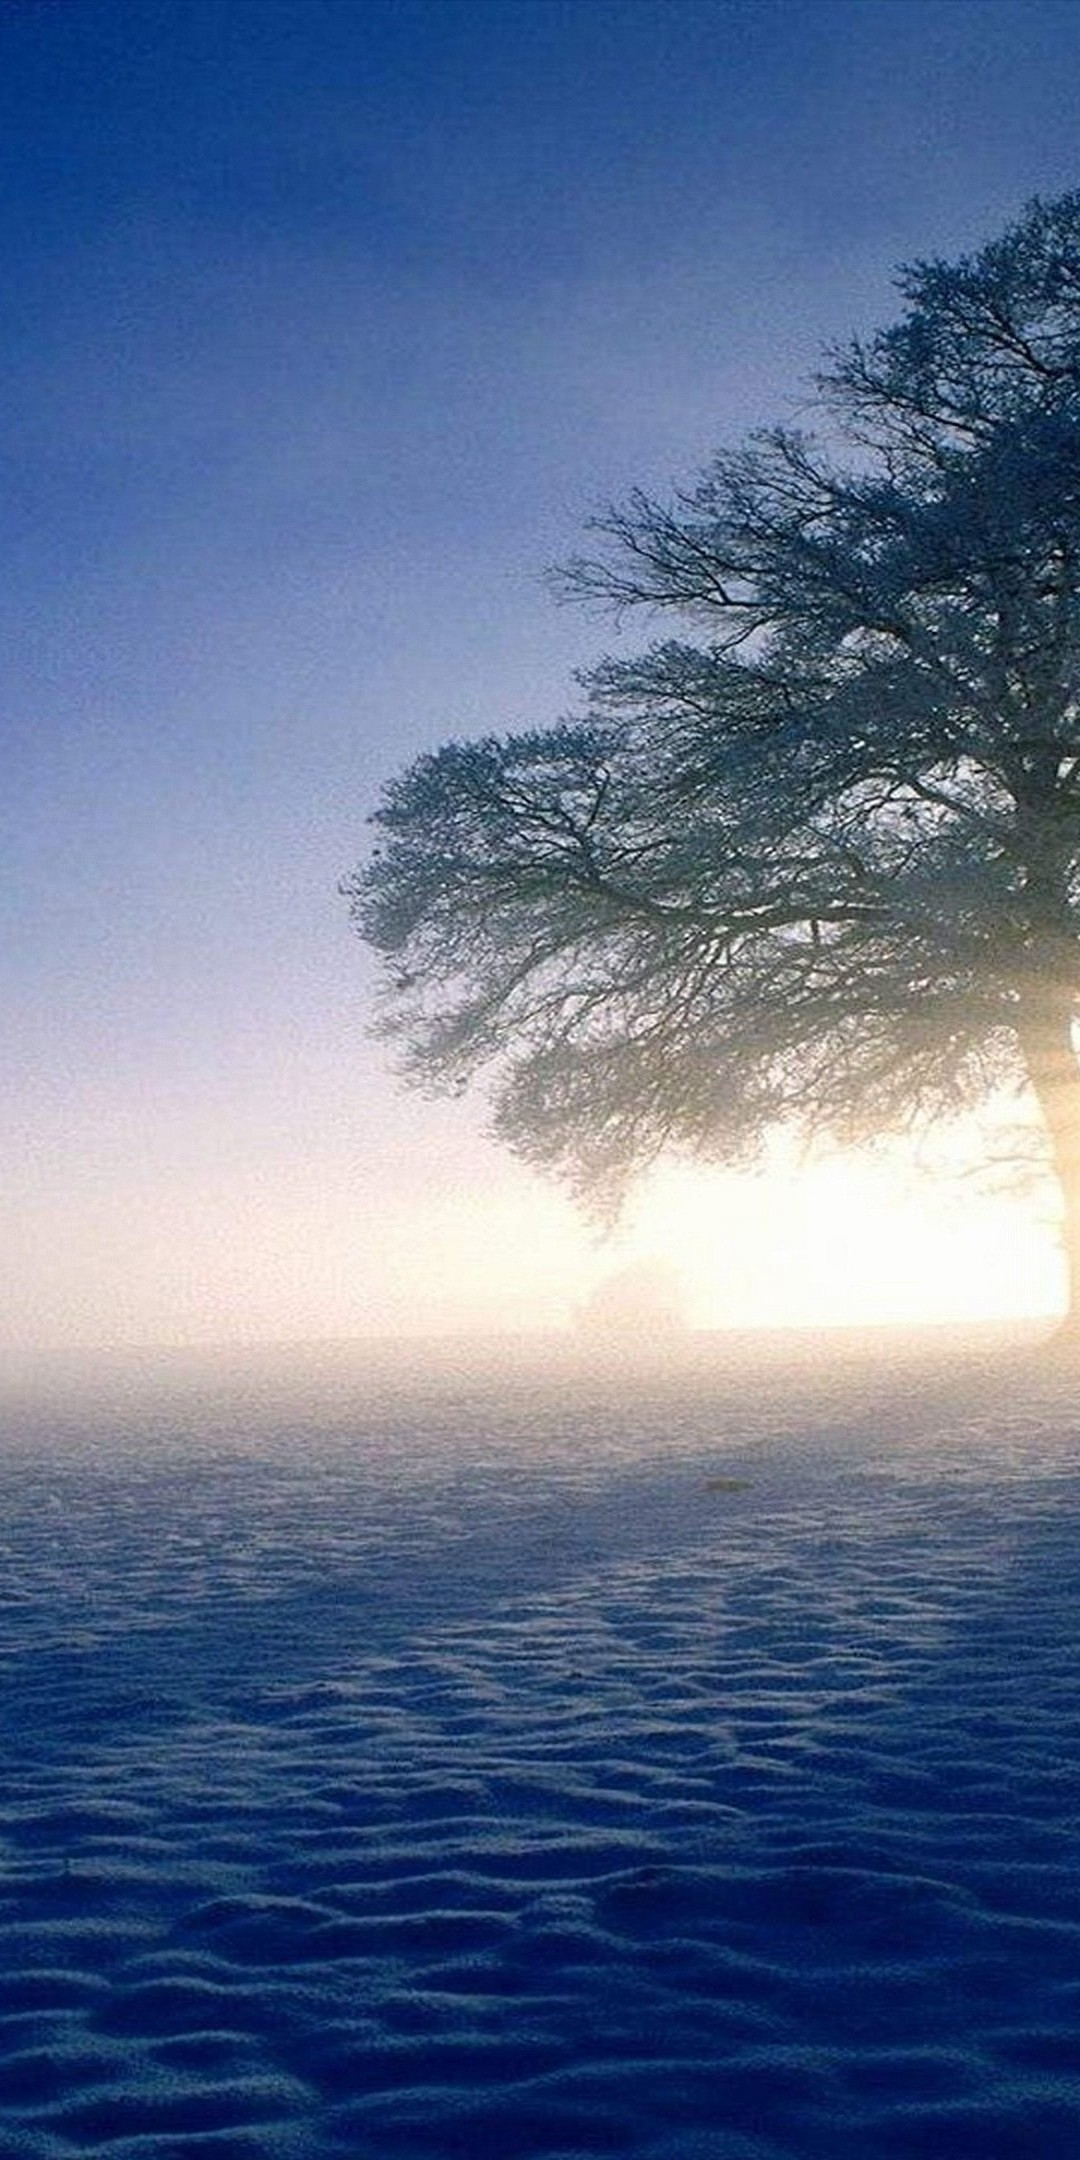 1080×2160 wallpaper: Plandscapes Nature Winter Snow Sun Ultra HD Wallpaper